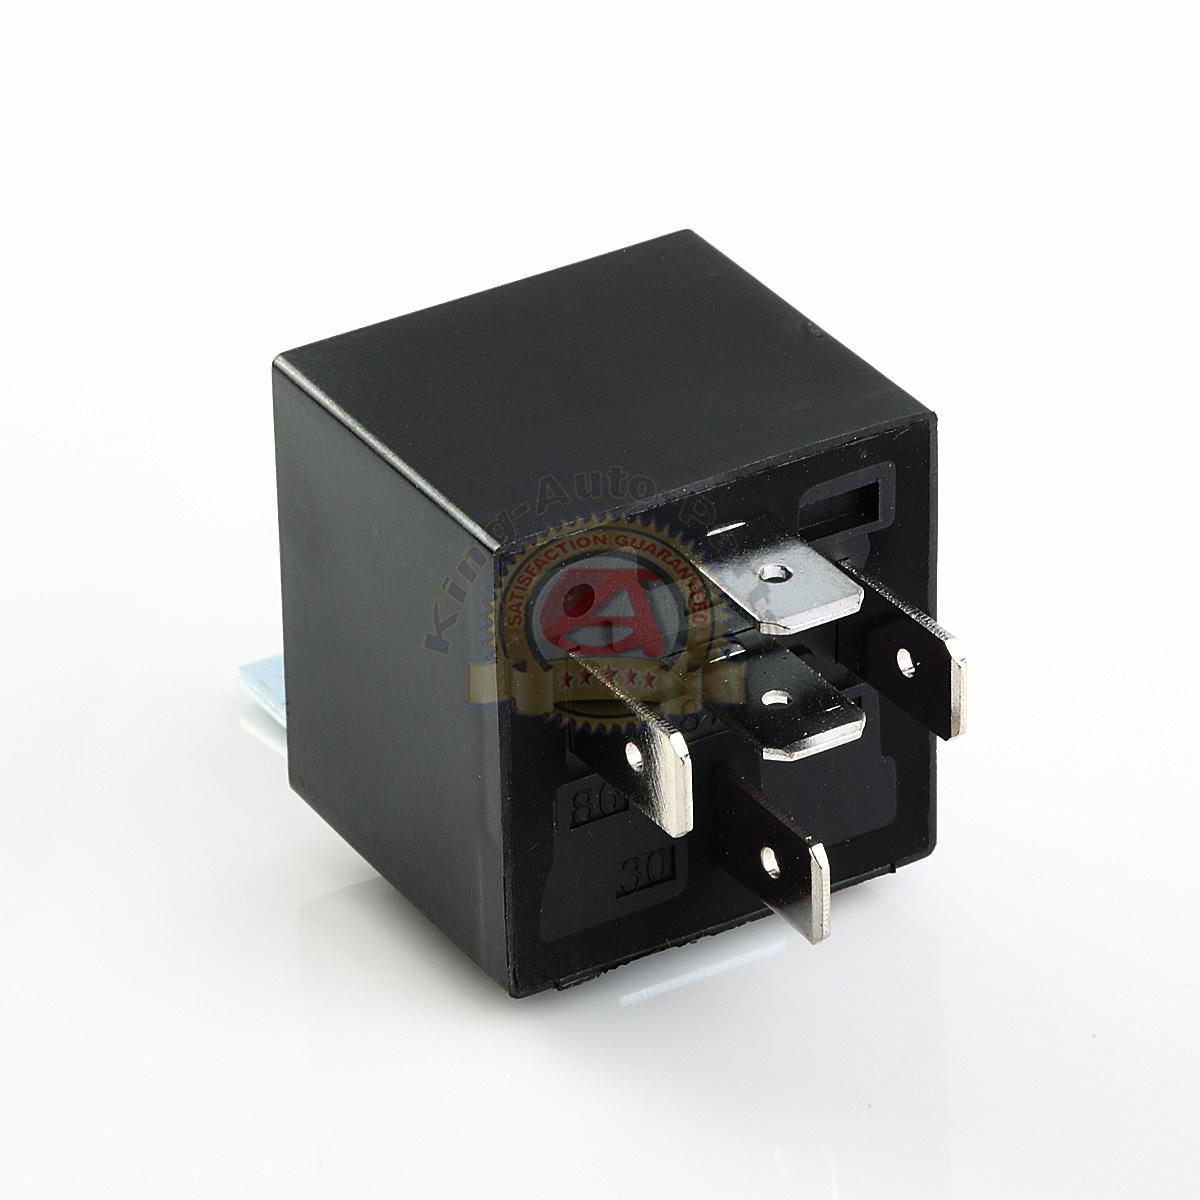 4007480719  Amp Relay Wiring Box on bosch 24v, 2 pole solid state, 5 pin 12 vdc, bitron 12v, 12v 4 prong, standard part number, bosch 12v, diode 4 prong,